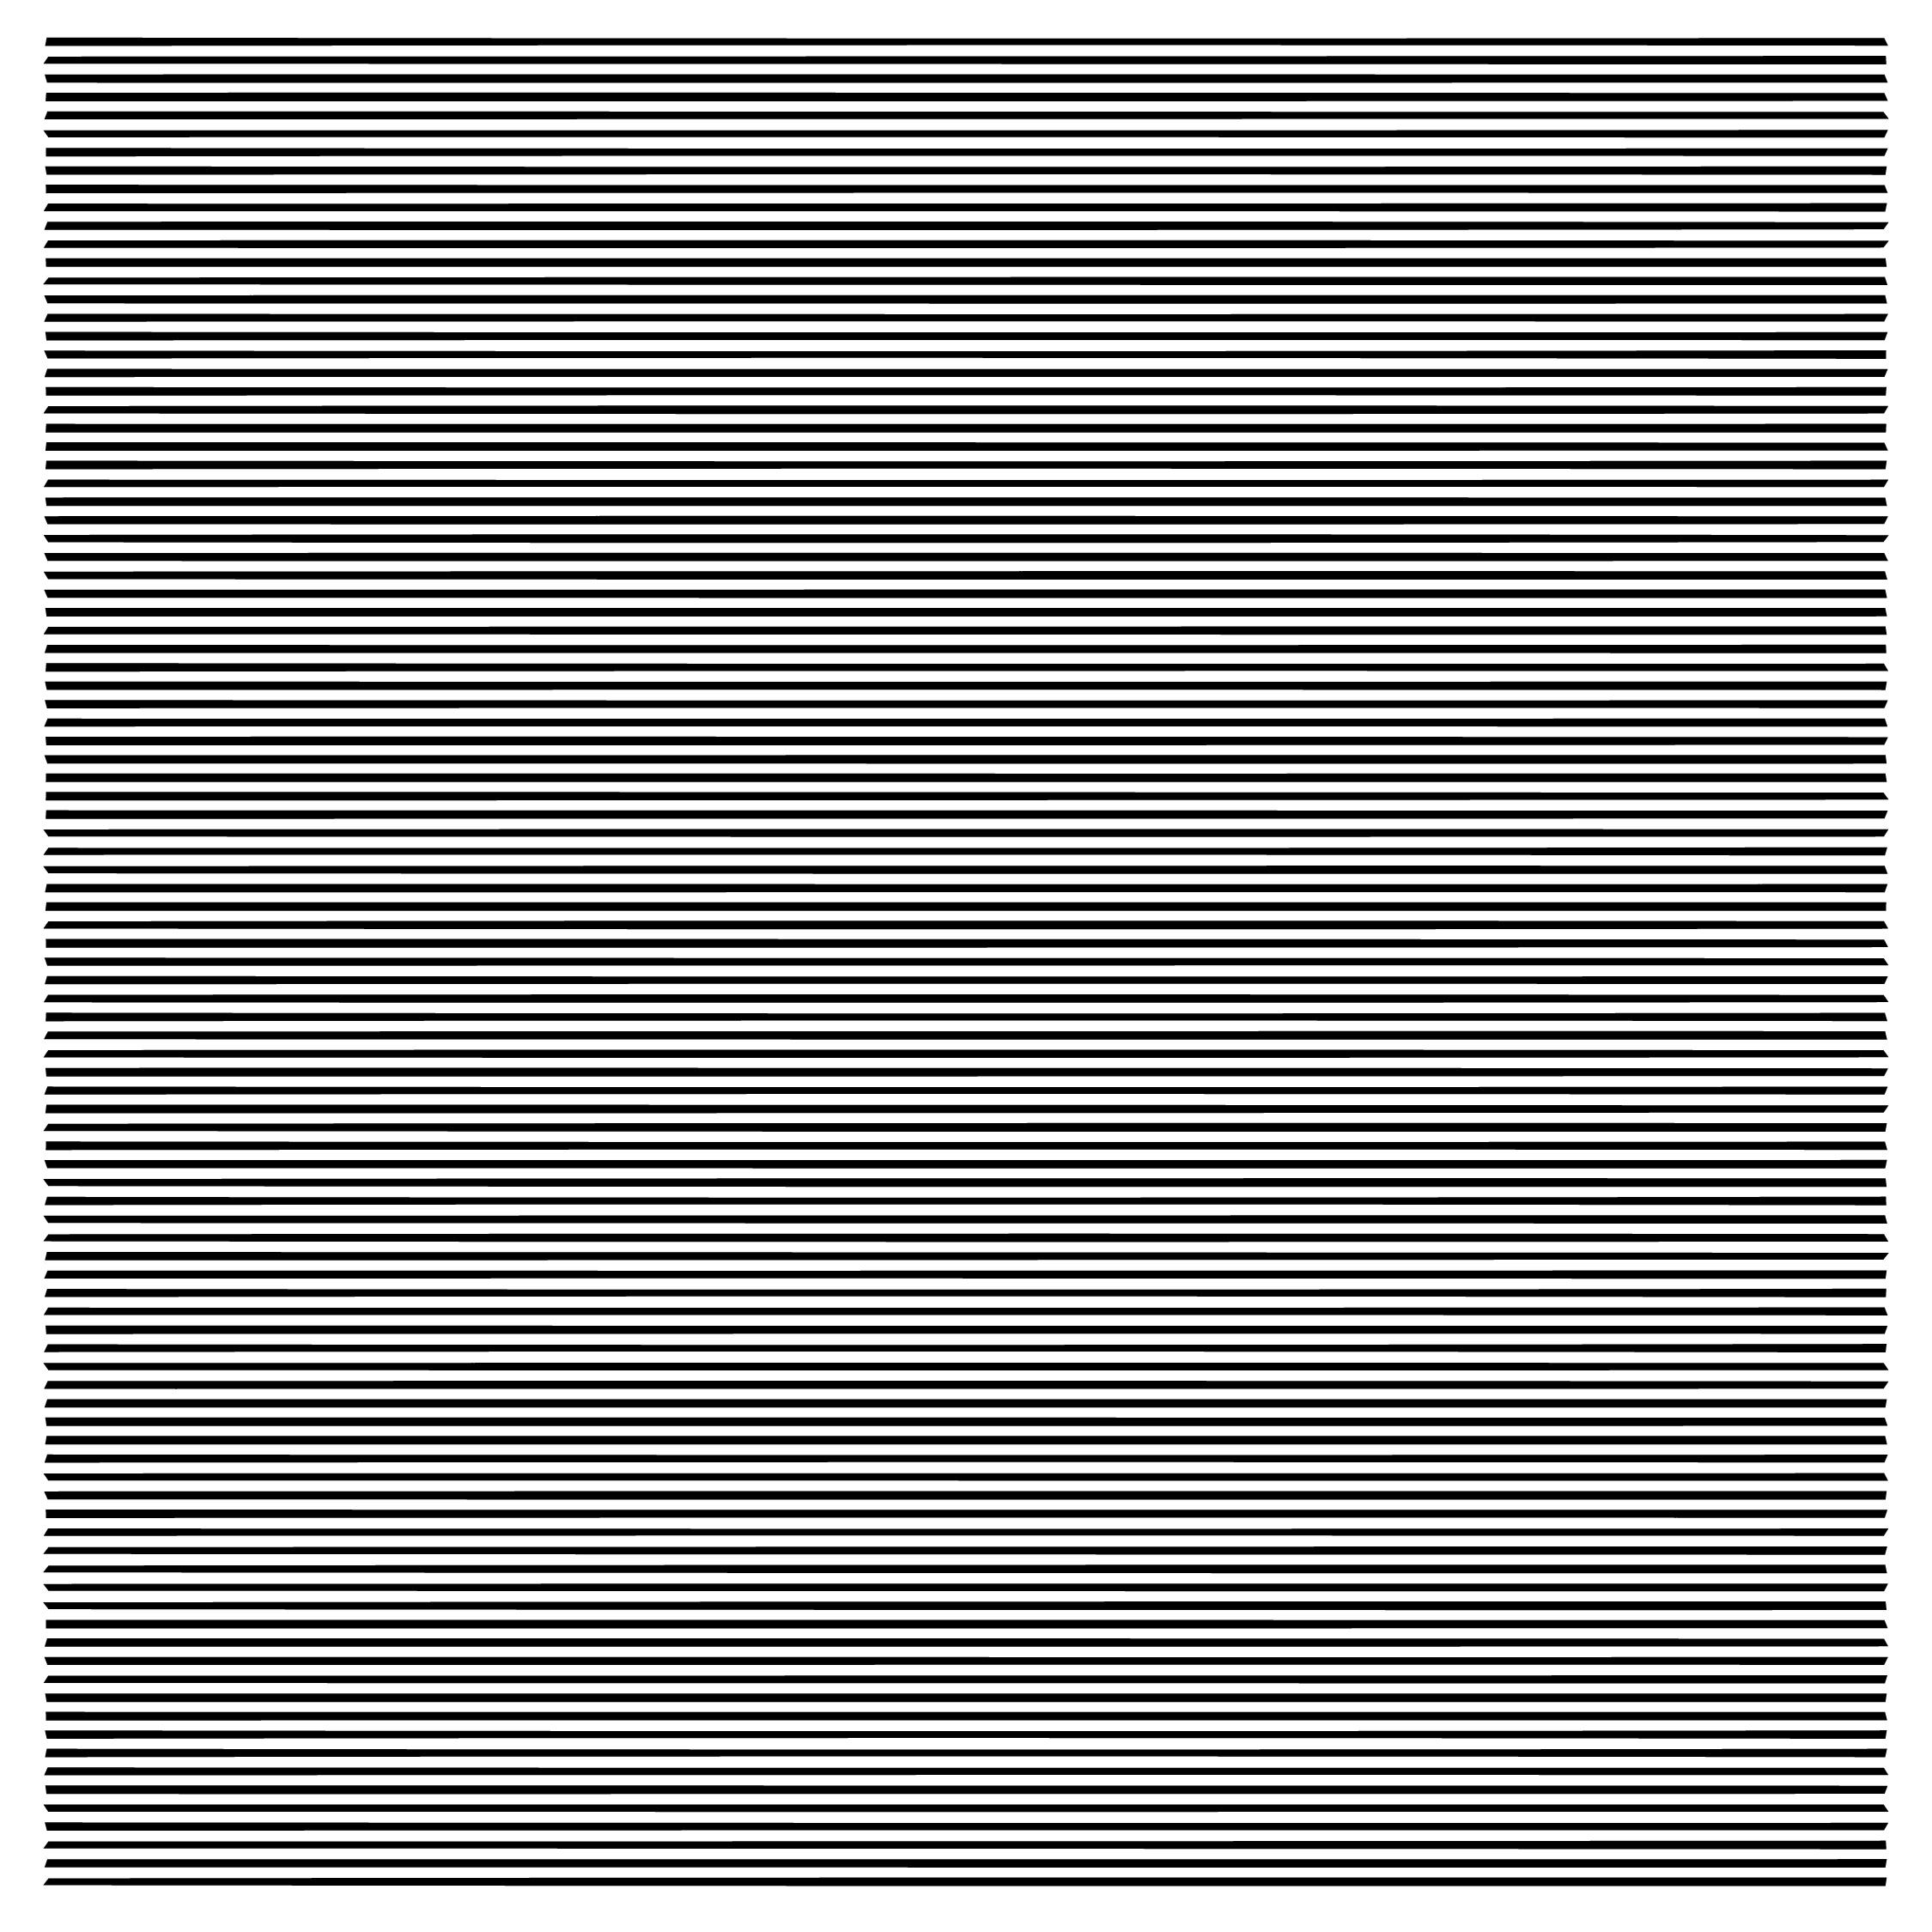 wlines-03.jpg